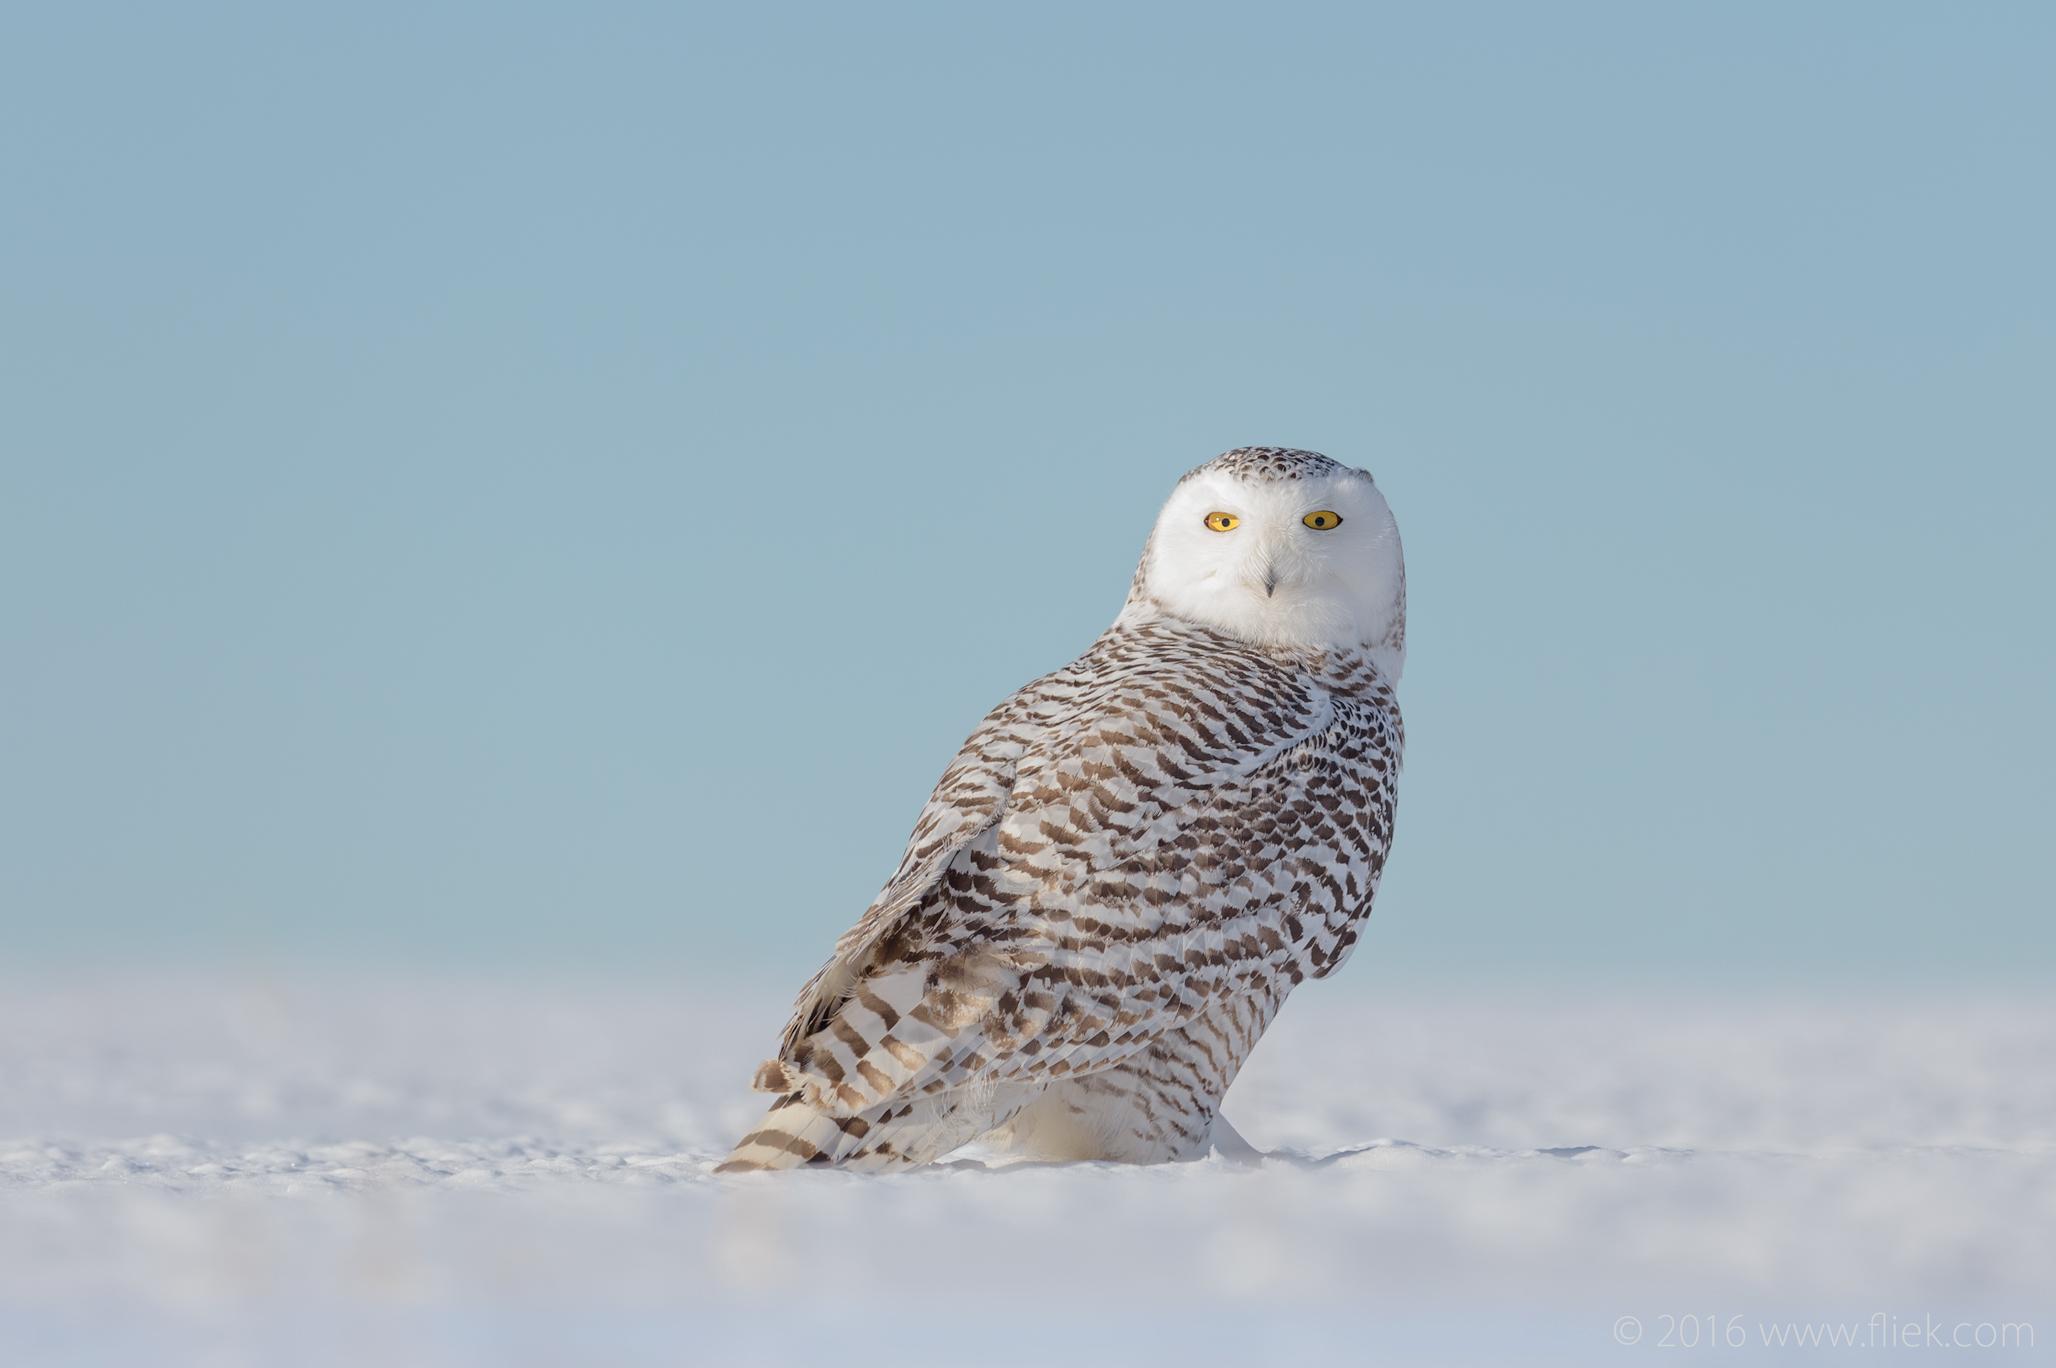 Snow Owl13-part3